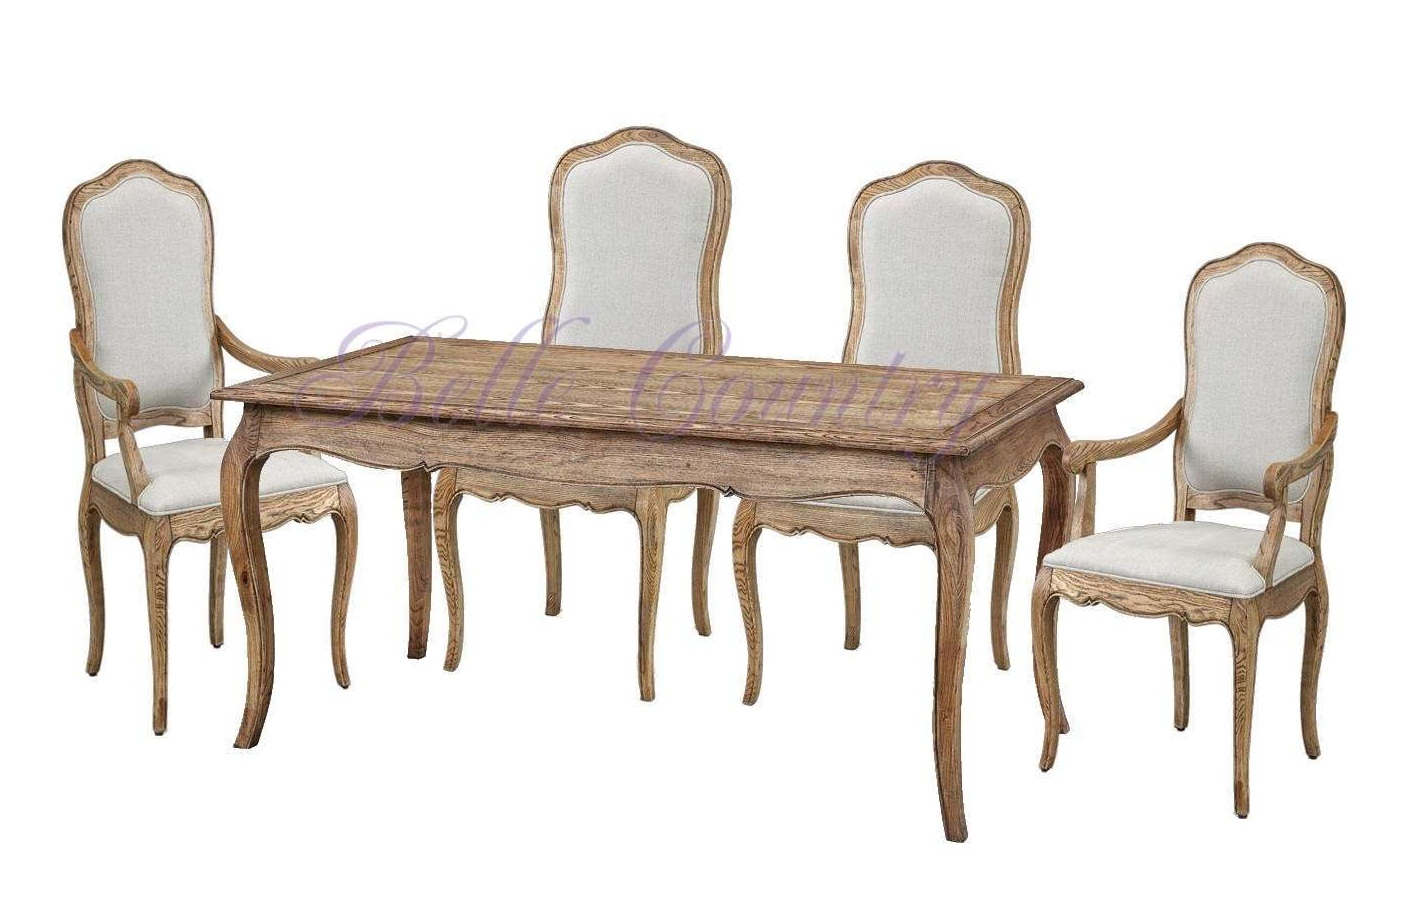 2-Комплект-Стол-обед.-KFD007-7-2кресла-KFD007-20-4стула-KFD007-21-цвет-natural-oak-собран